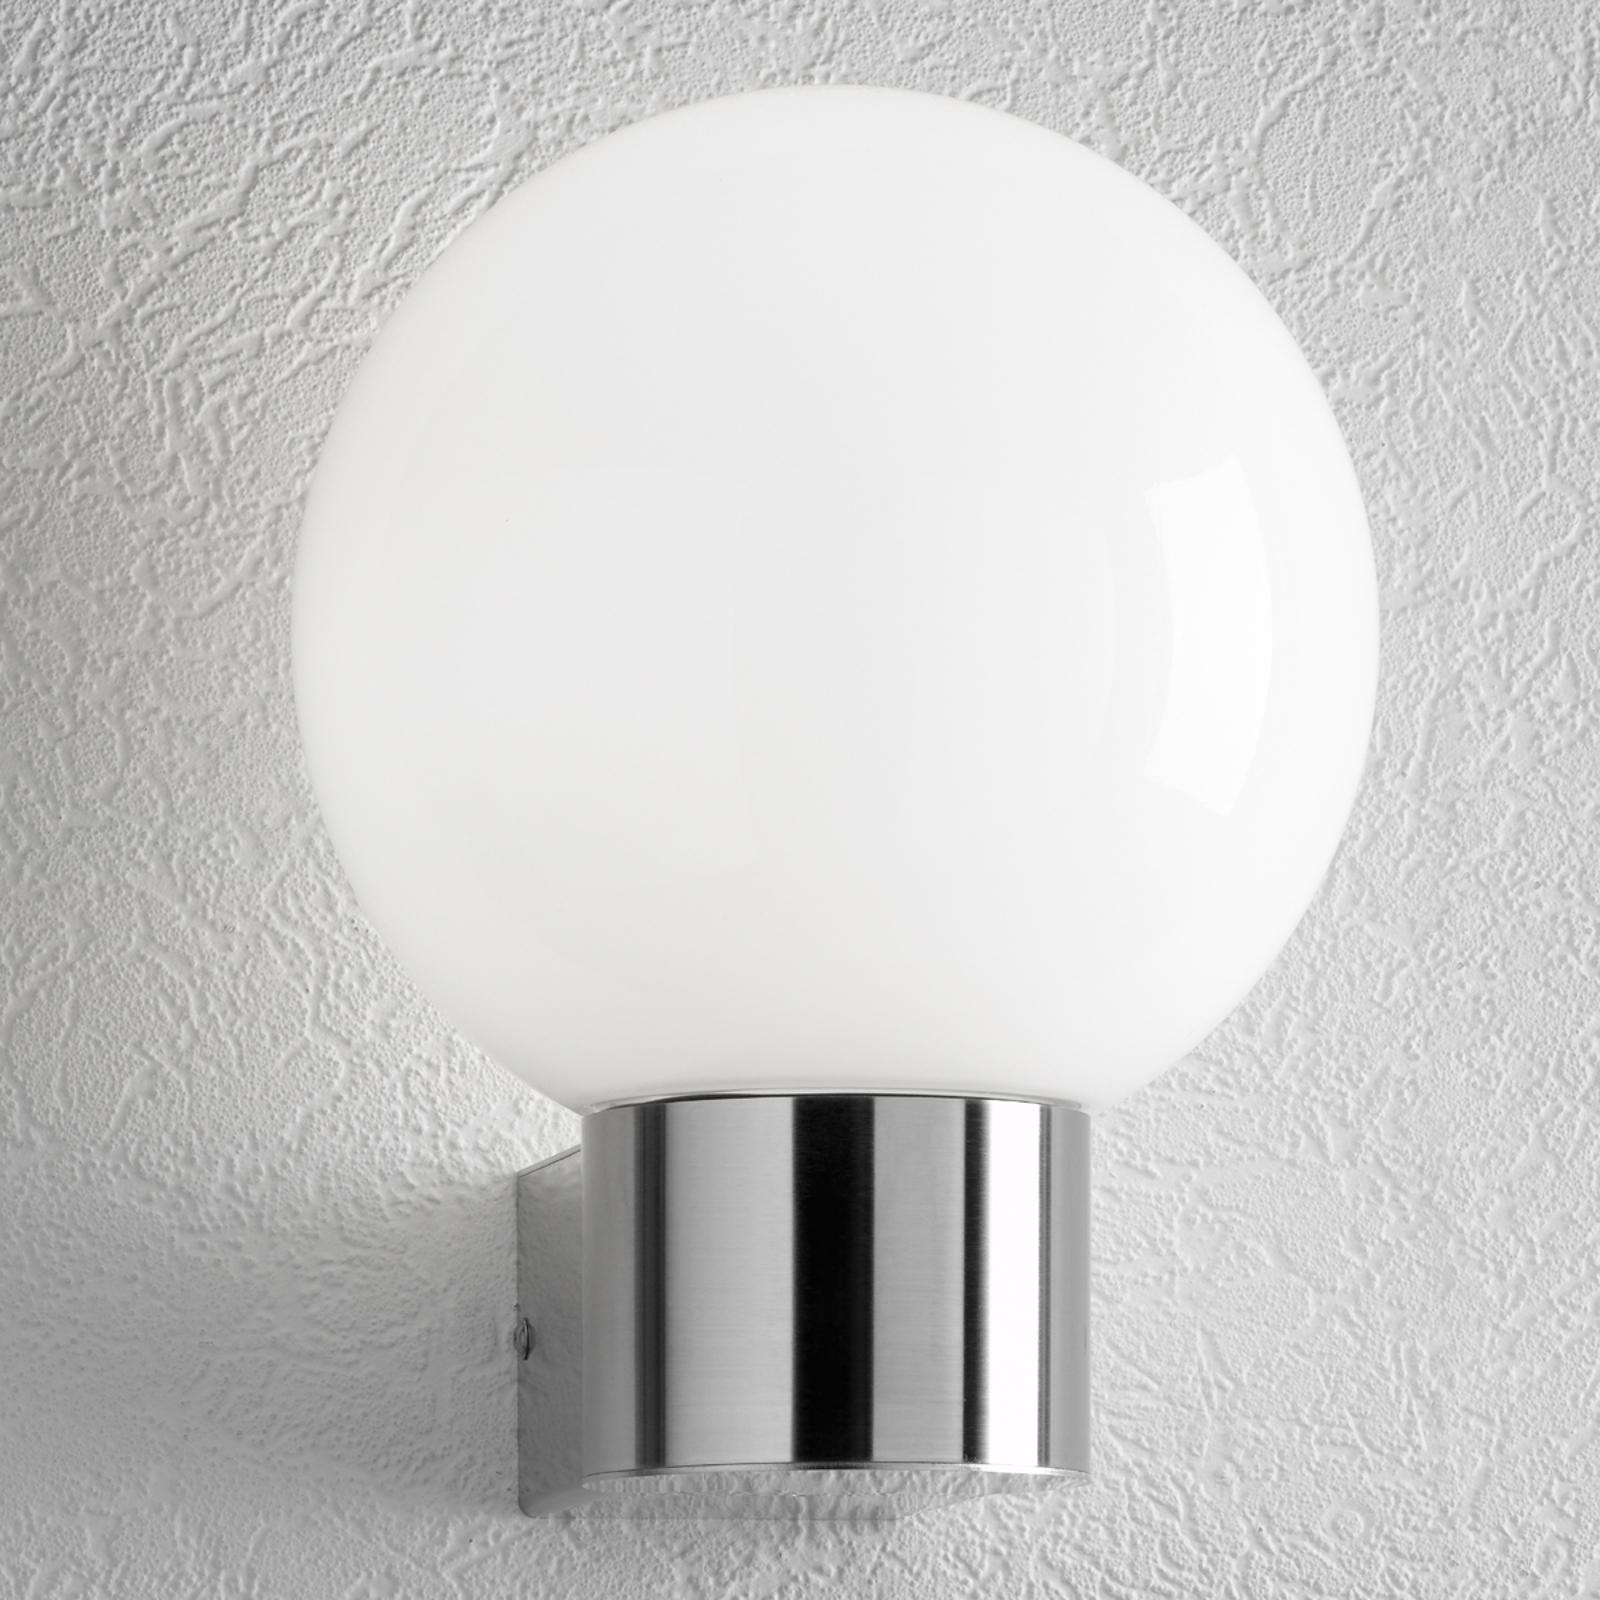 Rvs buitenwandlamp KEKOA, zonder sensor